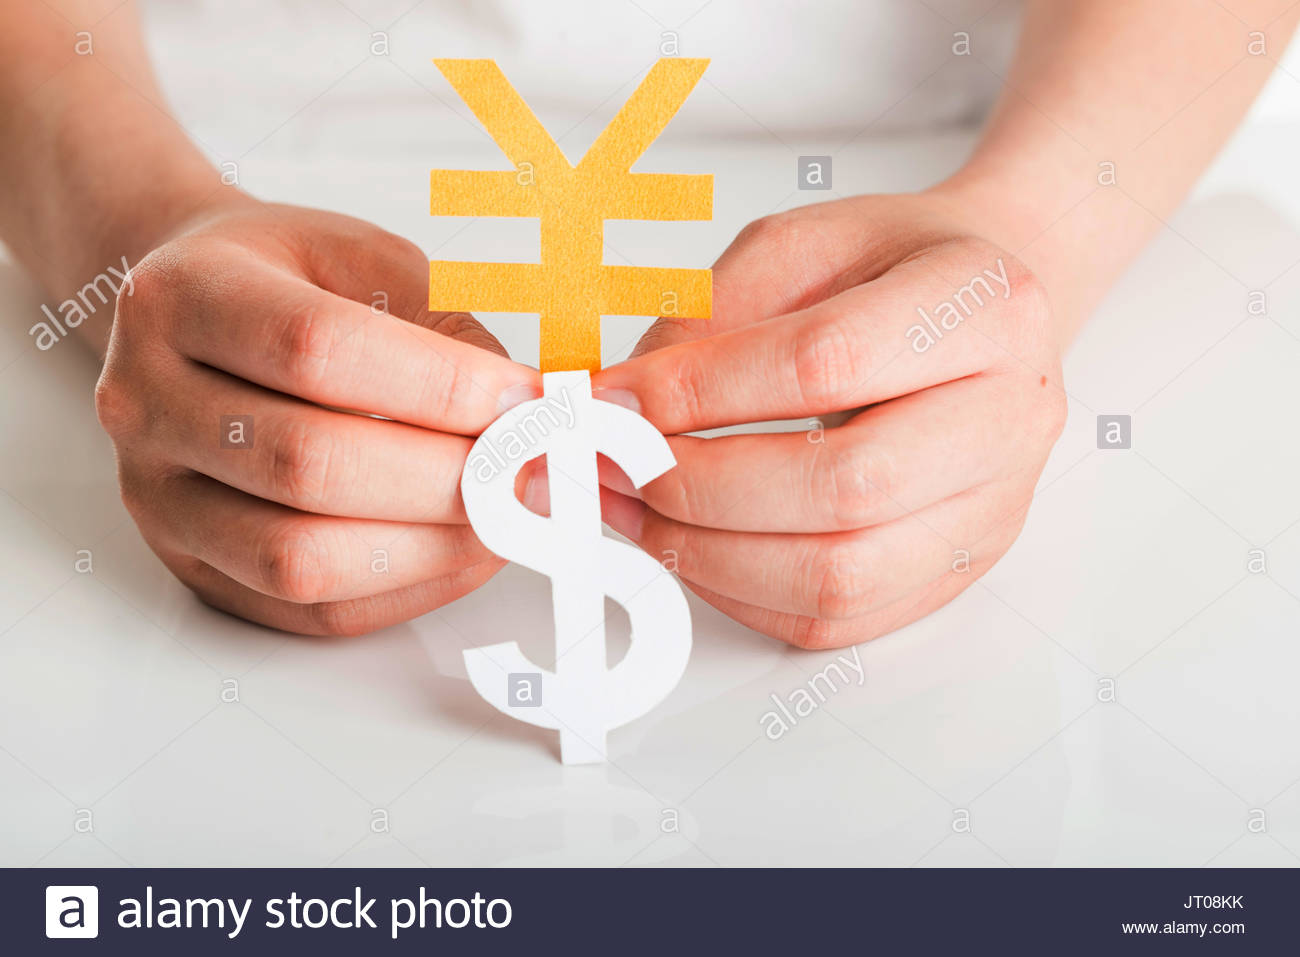 Currency symbol stock photos currency symbol stock images alamy human hand and currency symbol stock image buycottarizona Images